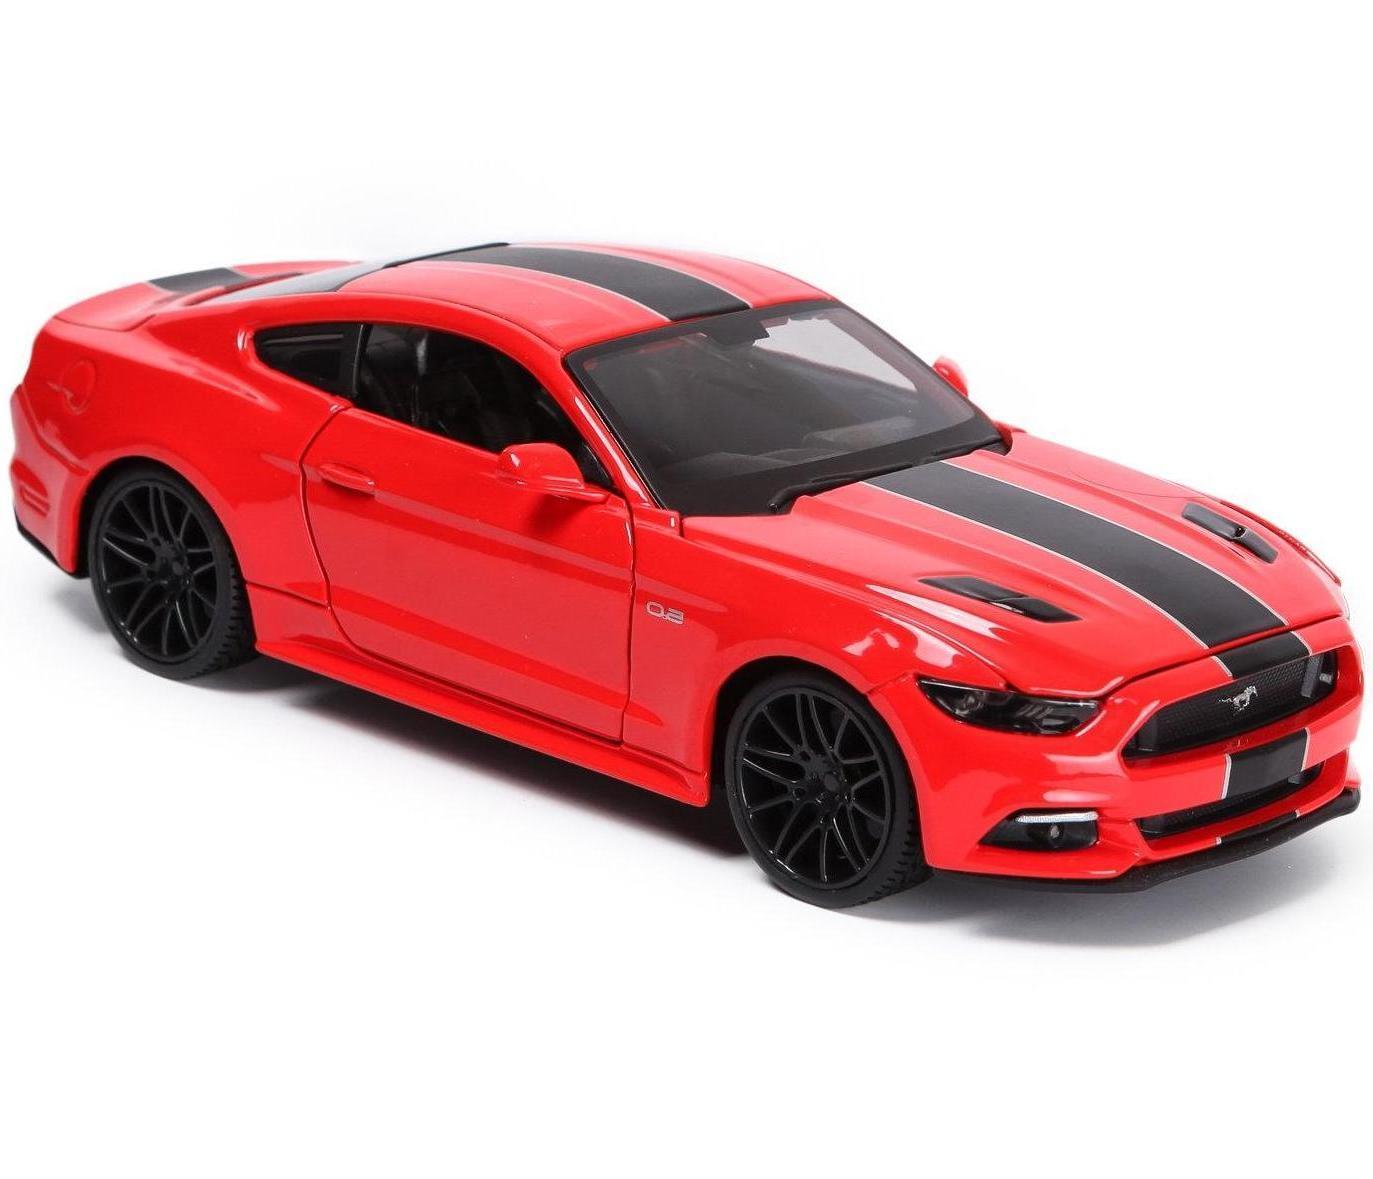 Машинка Maisto 1:24 Ford Mustang GT Год постройки 2015, красная